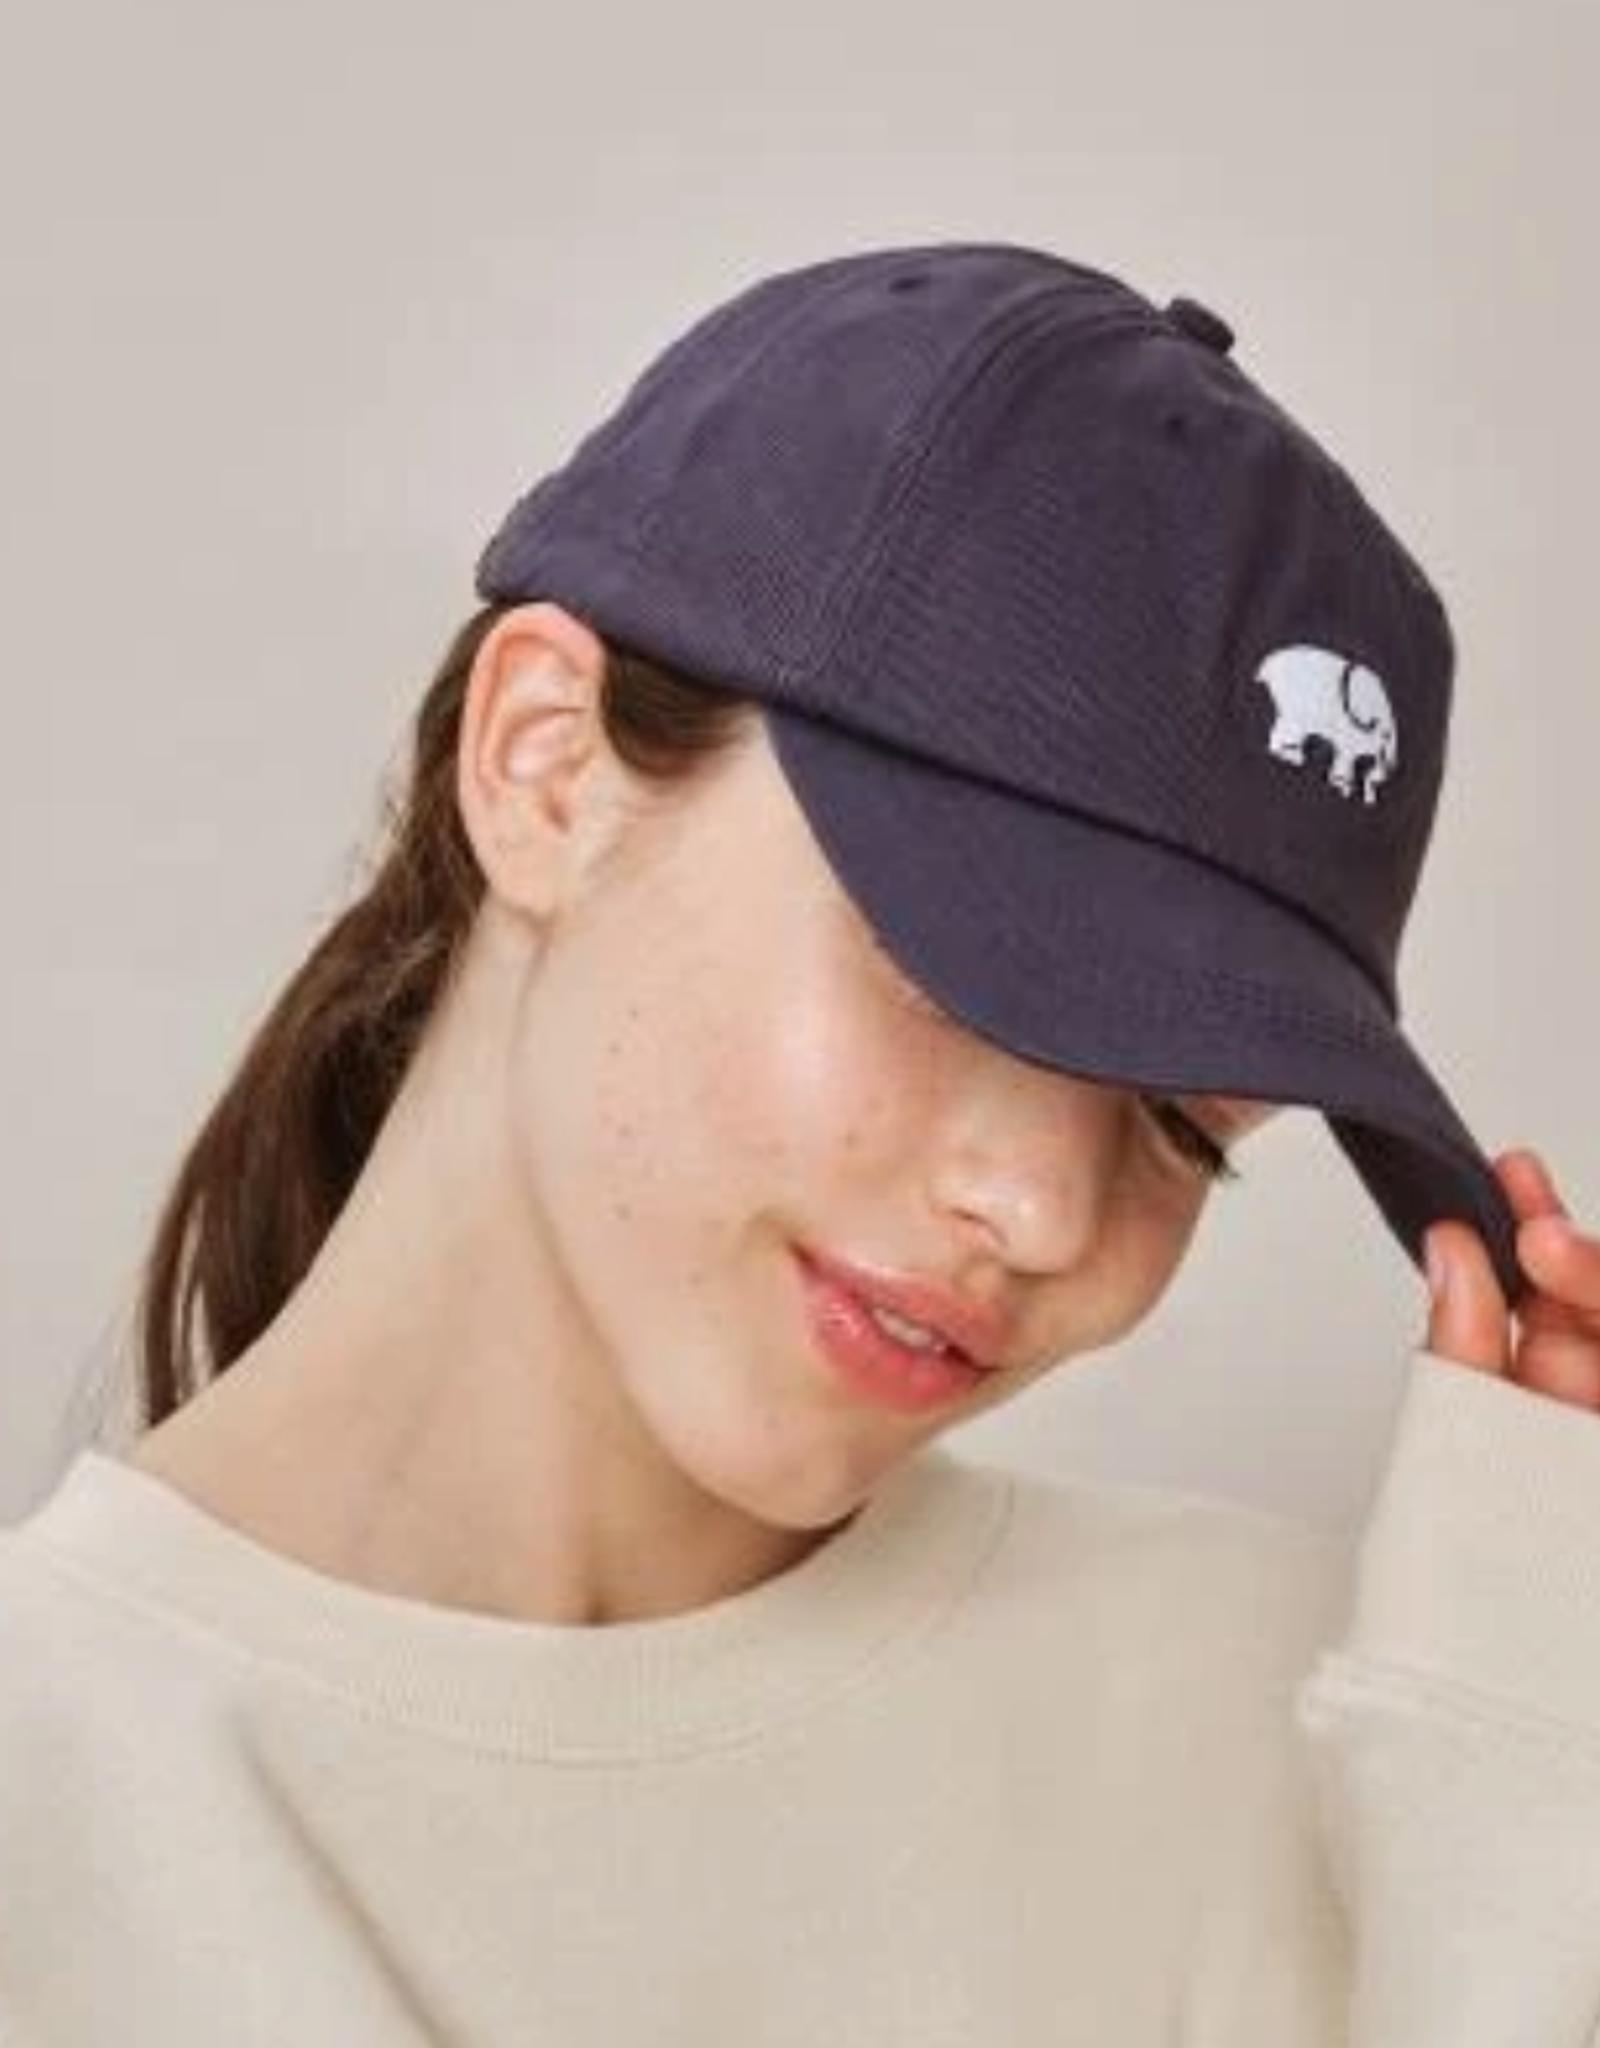 Ivory Ella Ivory Ella - Baseball Hat